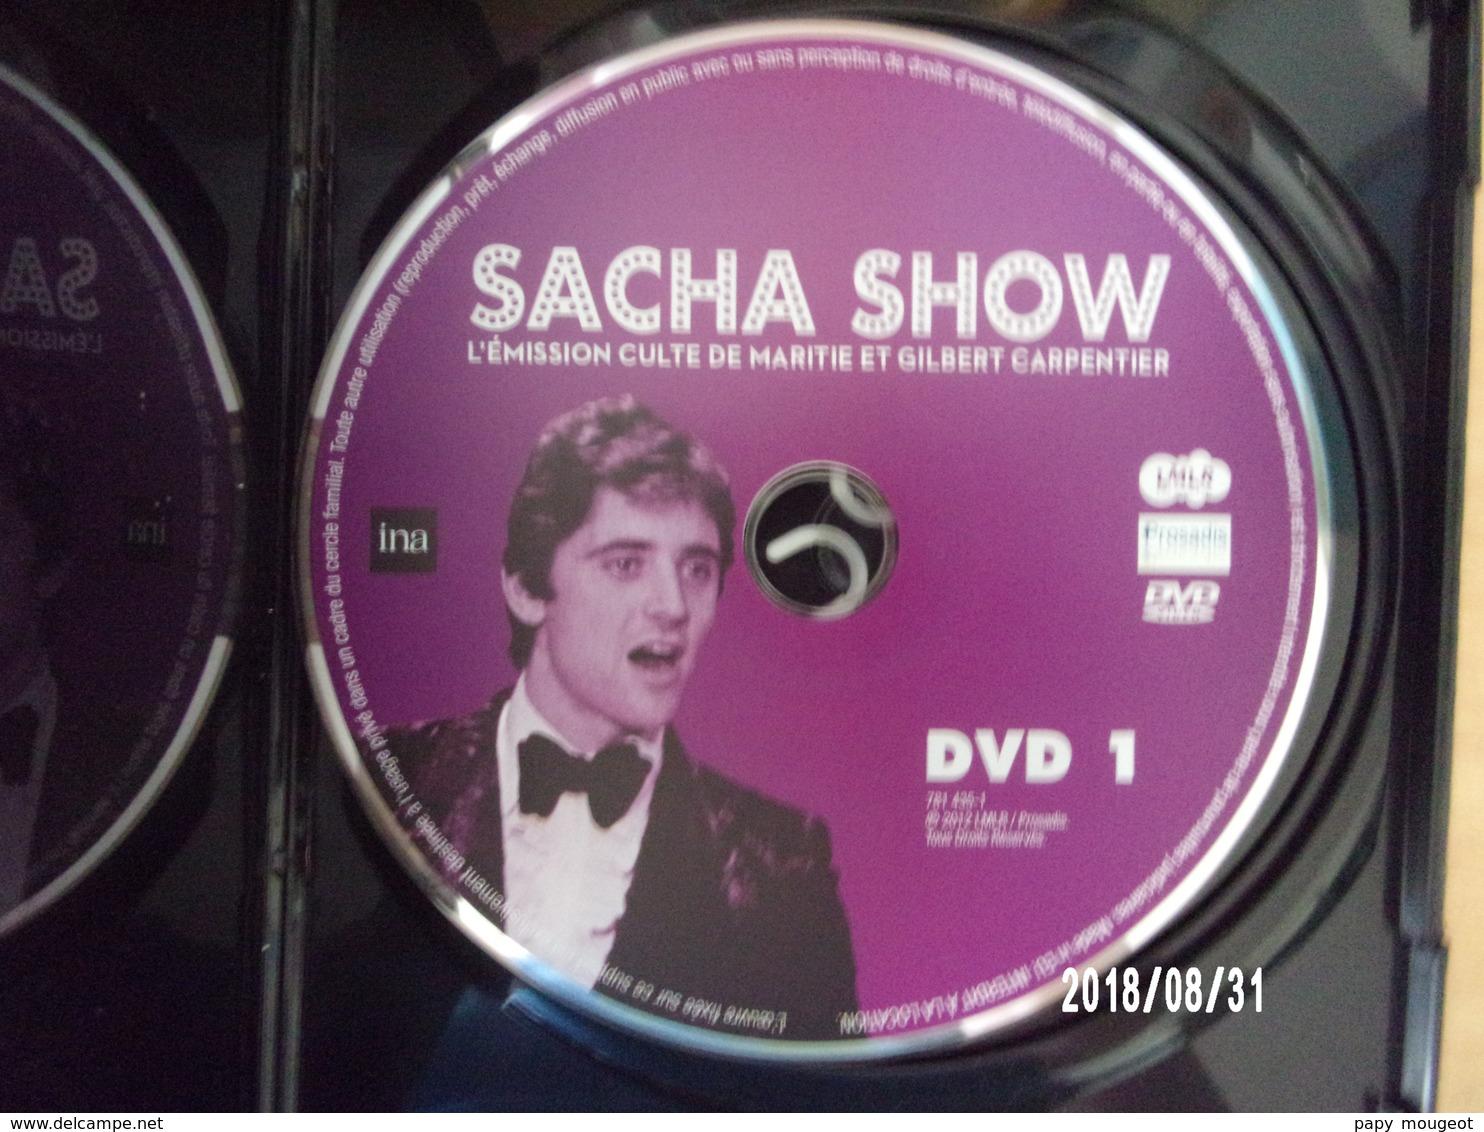 Sacha Show DVD 1 - Musik-DVD's